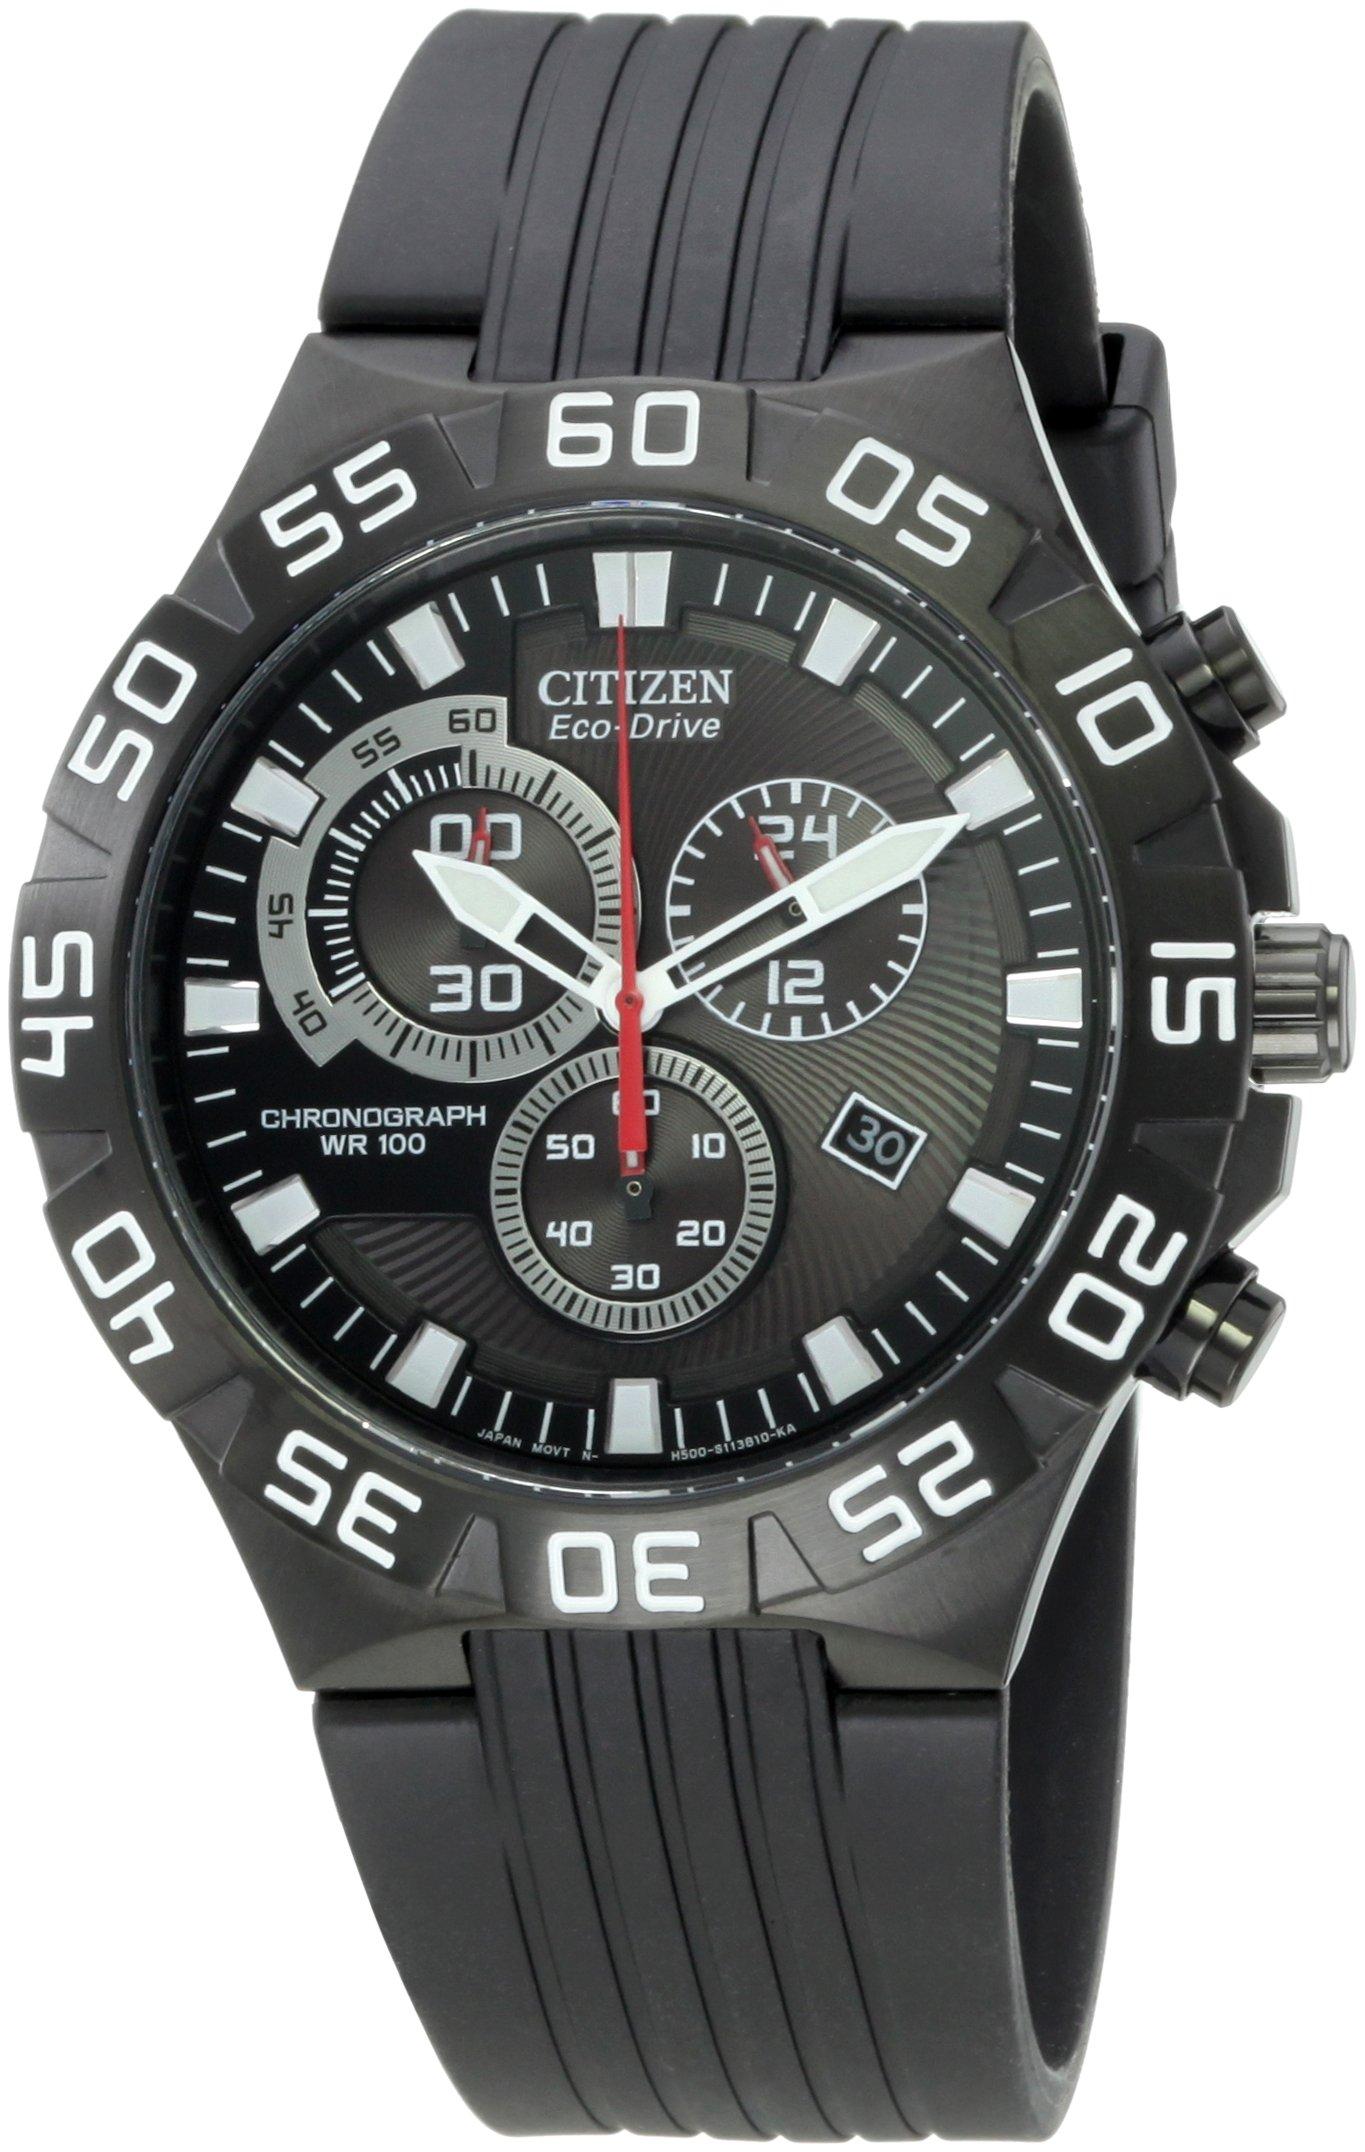 Citizen Men's AT2095-07E Eco-Drive Chronograph Watch